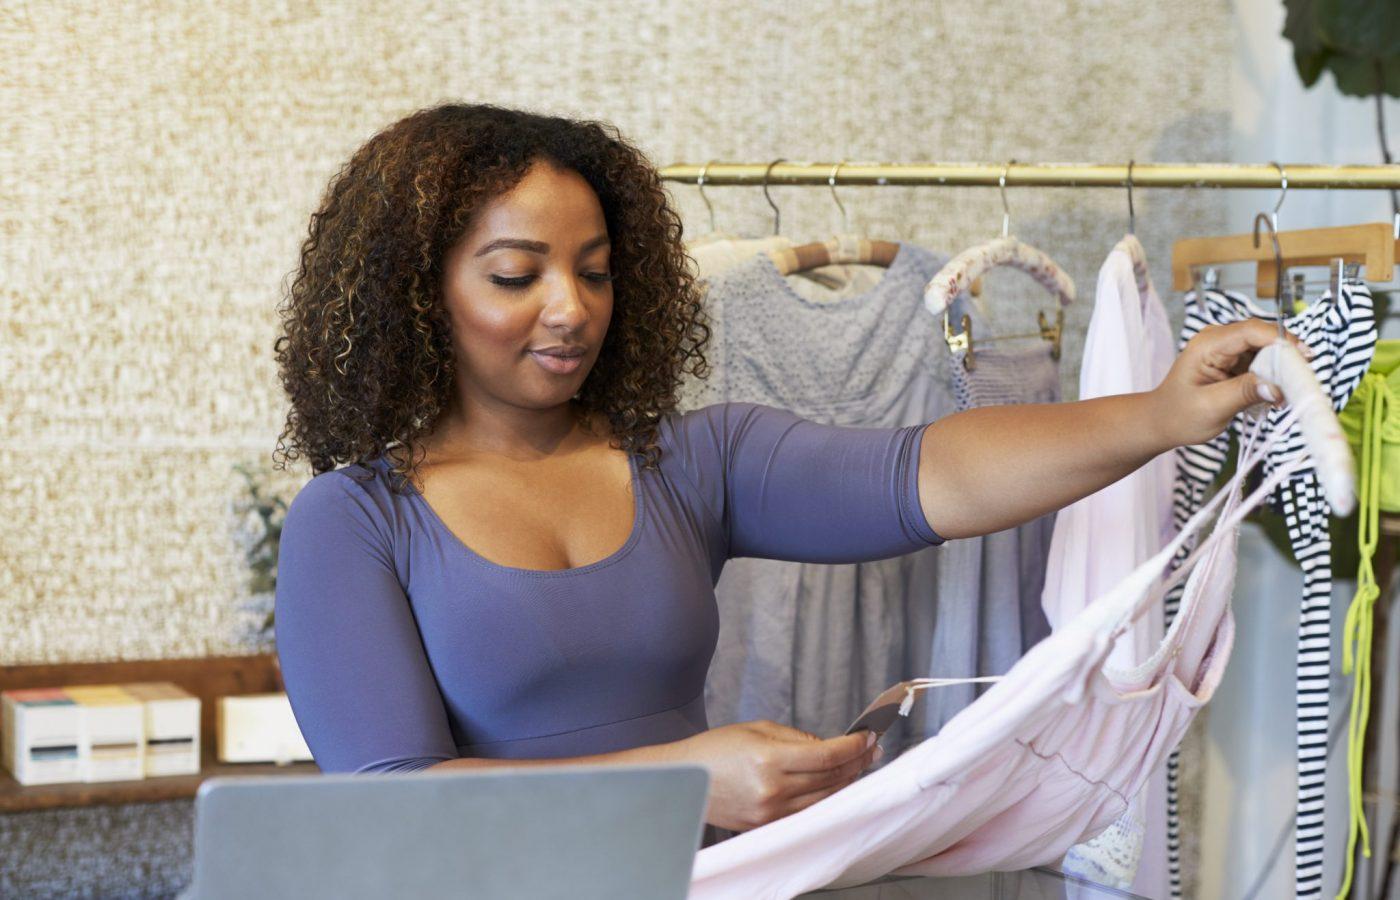 The Business of Fashion Accelerator Program